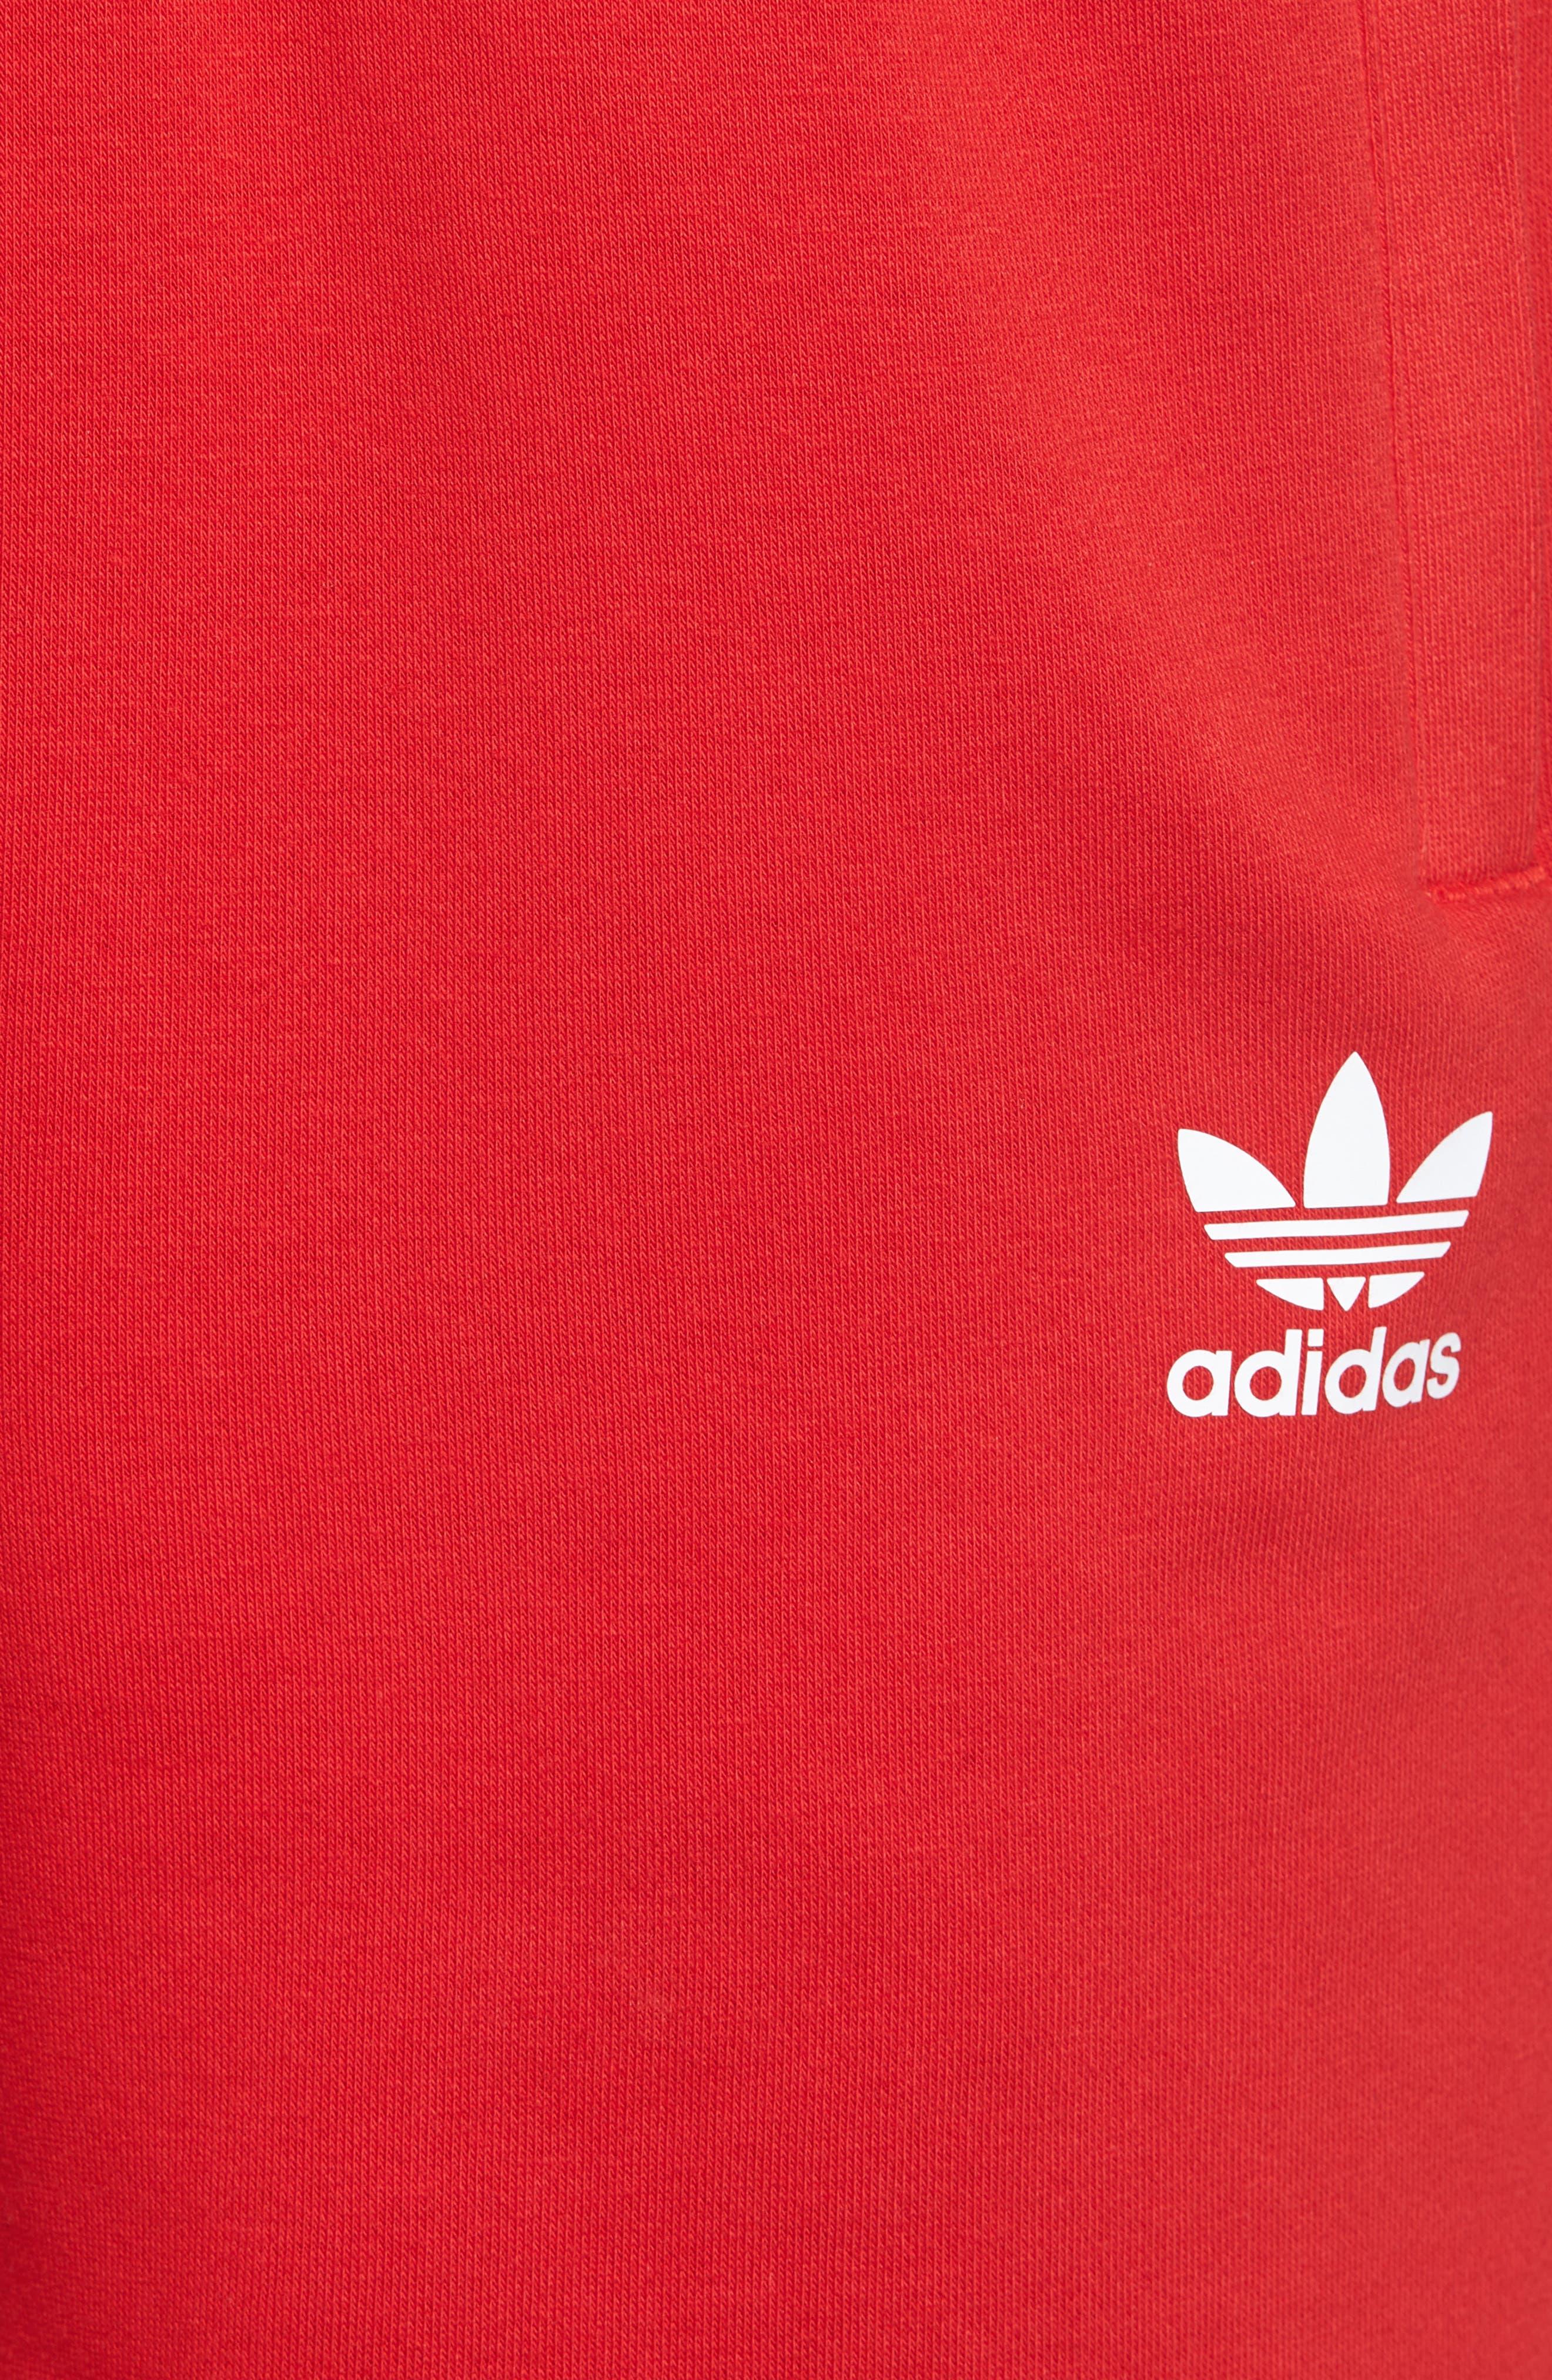 3-Stripes Shorts,                             Alternate thumbnail 5, color,                             Red/ White